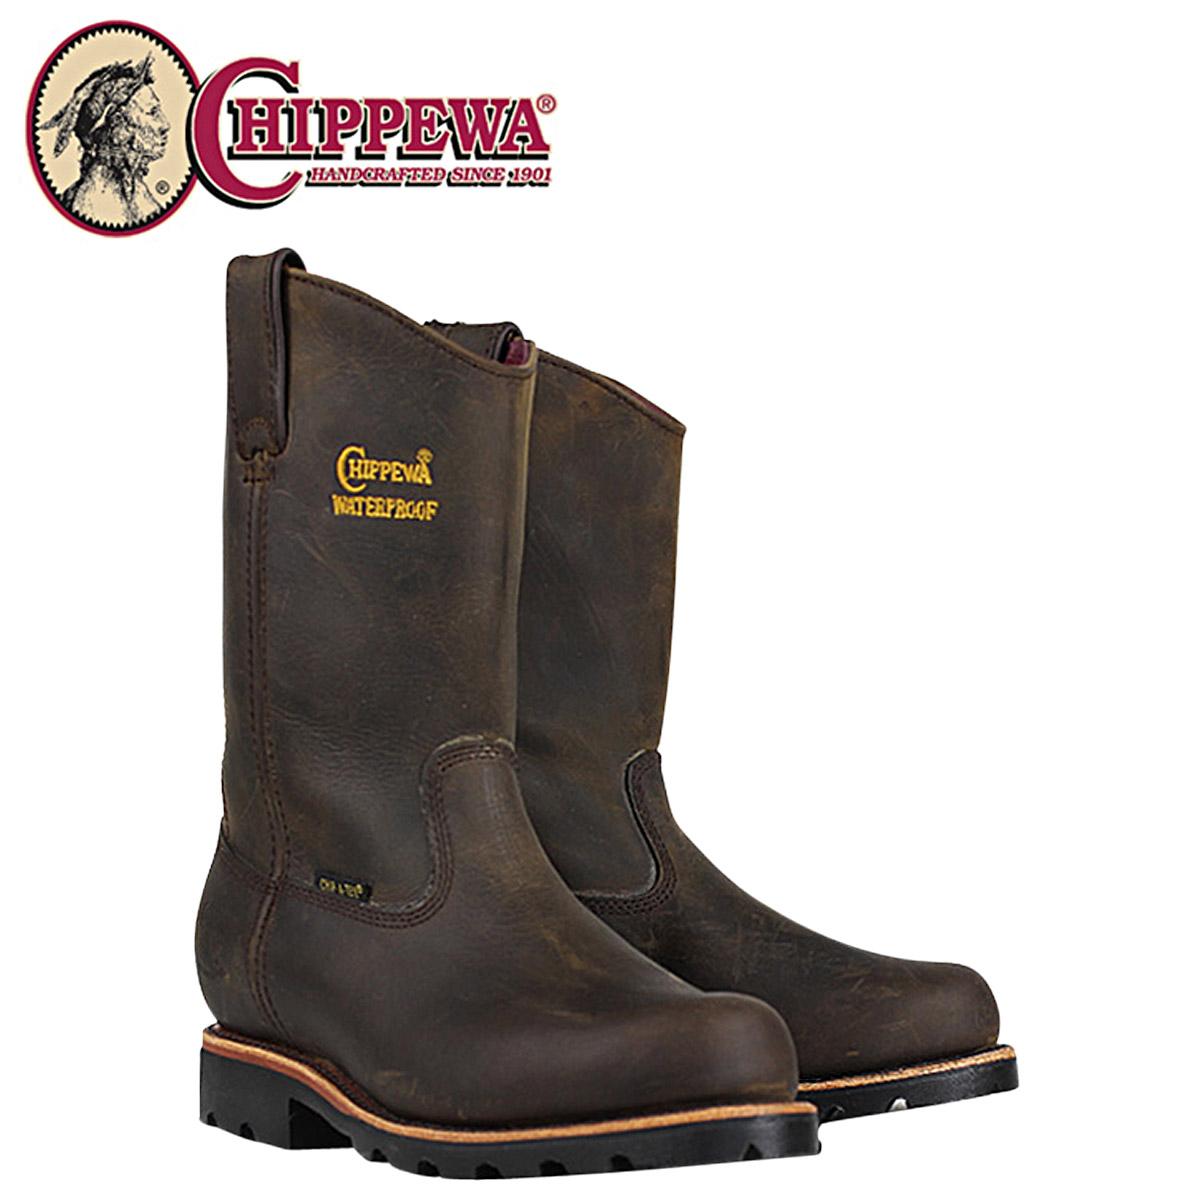 [SOLD OUT]chipewa CHIPPEWA 10英寸工作長筒靴海灣安帕奇25216 10INCH BAY CRAZY HORSE WATERPROOF 2懷斯皮革BAY APACHE人